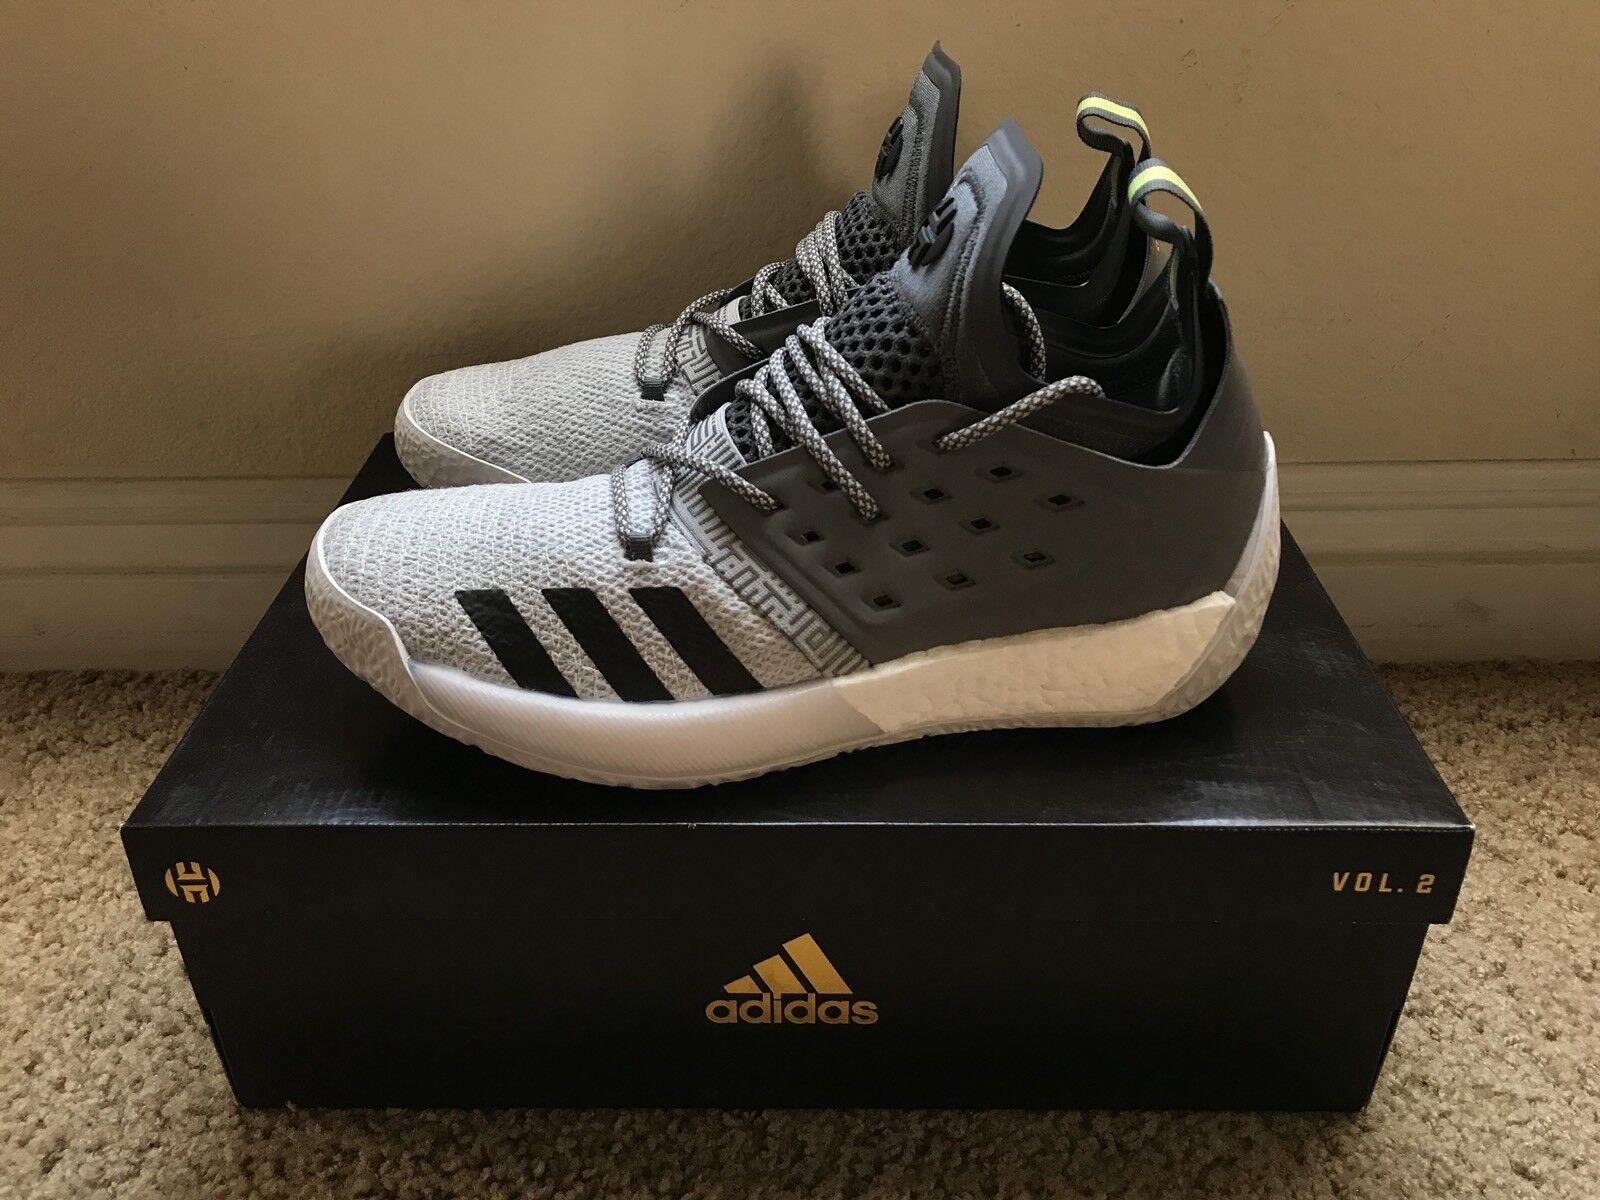 Adidas harden harden Adidas vol. 2 sz 10 ae0d57